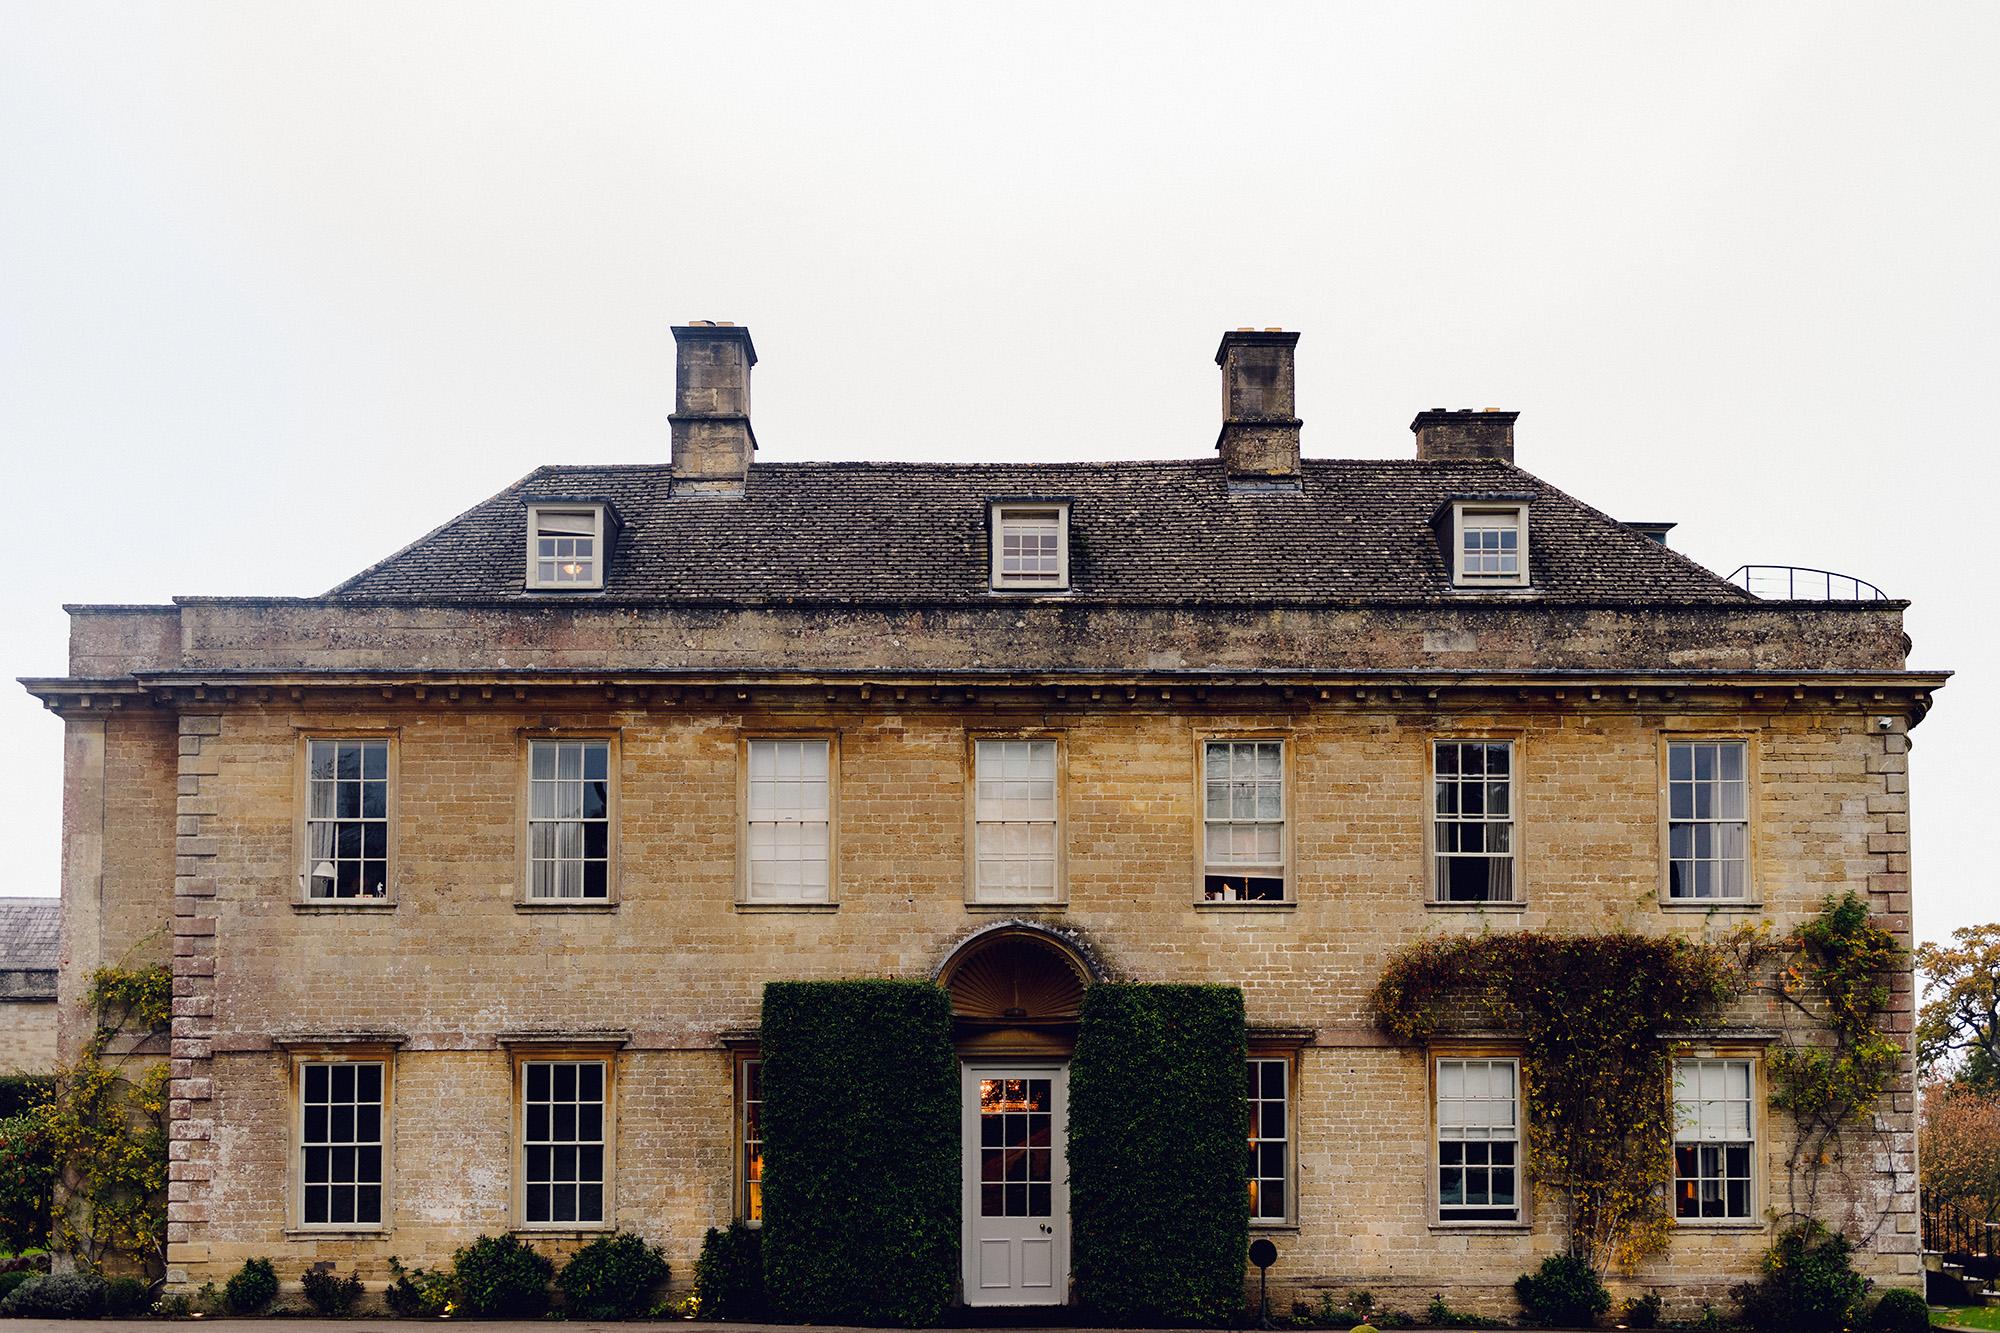 Babington House front entrance - Somerset, England - photo by Ash Davenport of Miki Studios